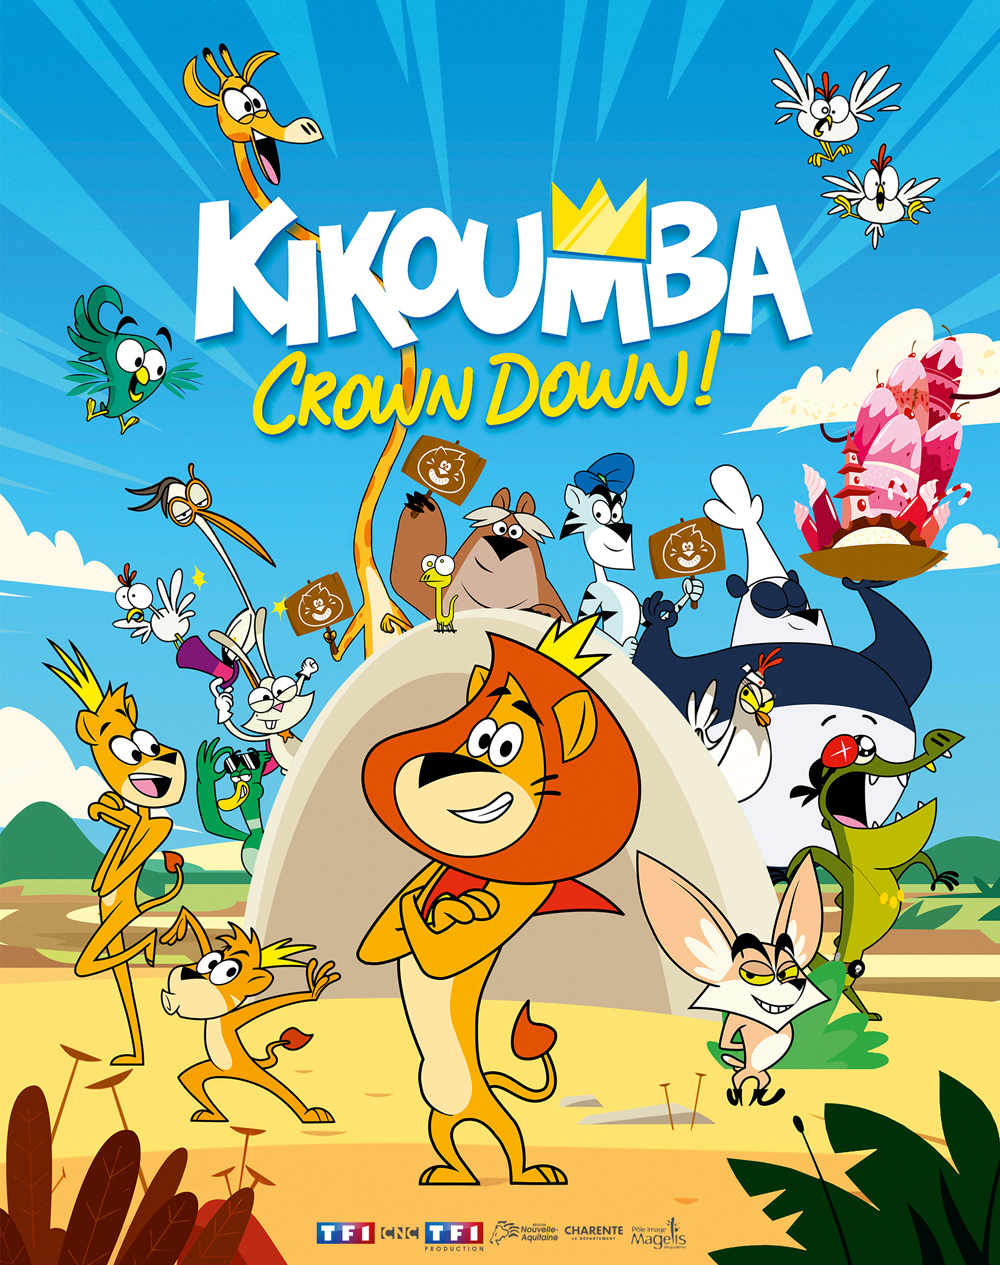 Kikoumba